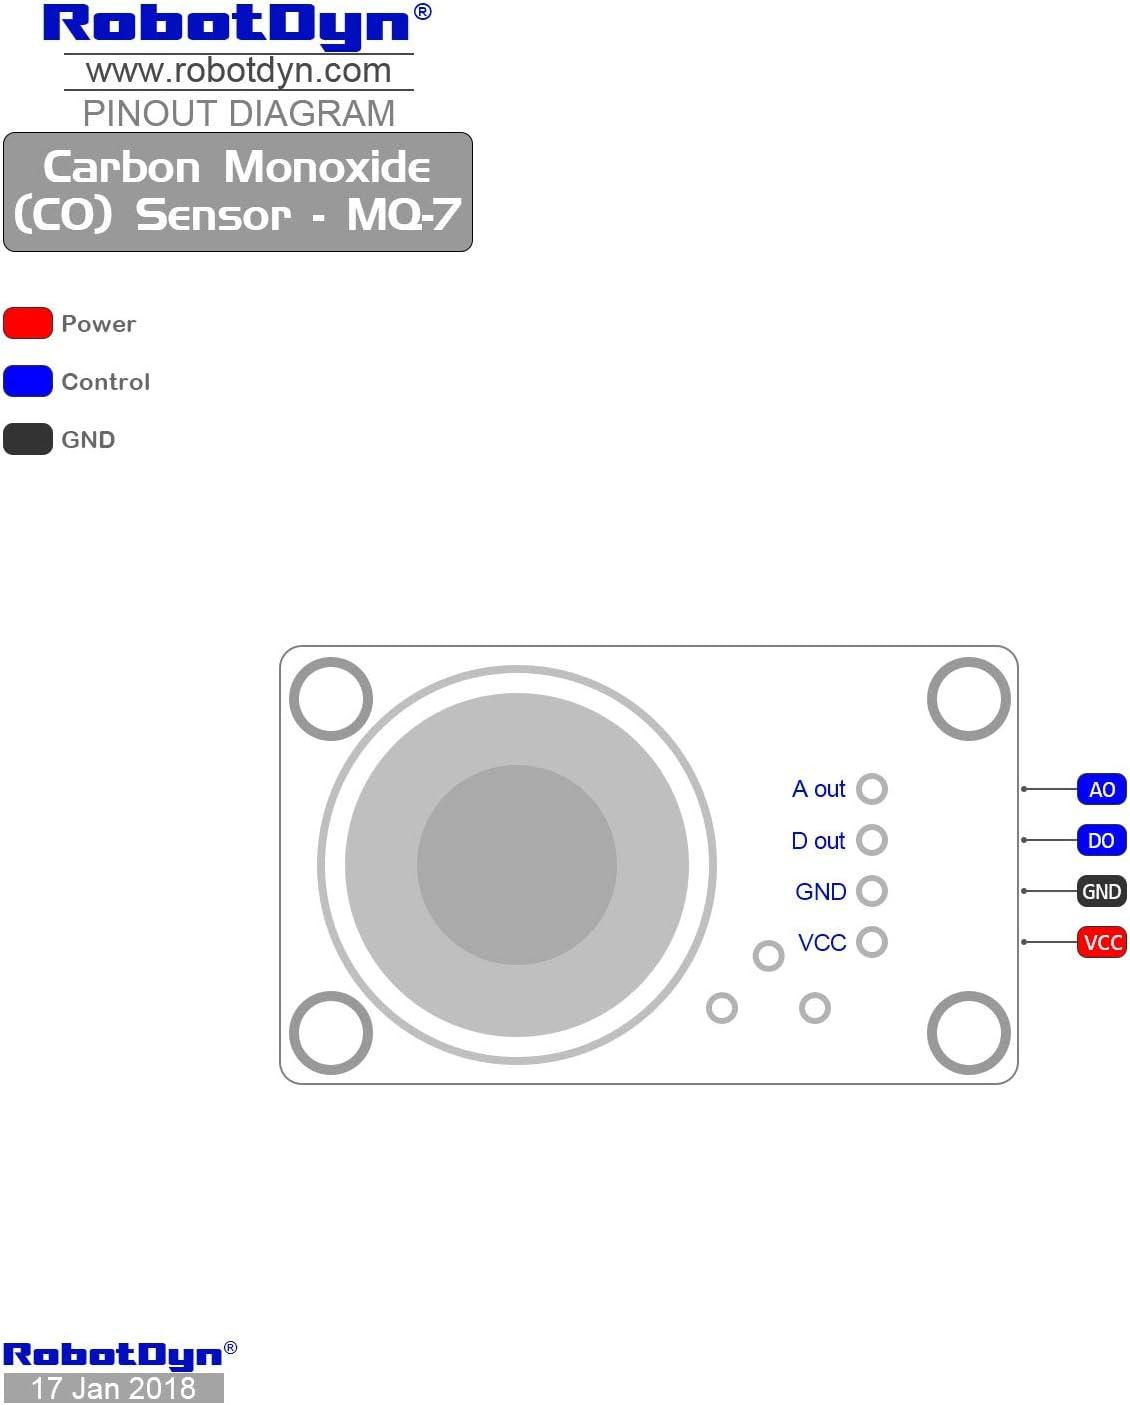 RobotDyn STM32 Analog and Digital Out for DIY Projects Arduino MQ-8 Raspberry pi Hydrogen Gas Sensor